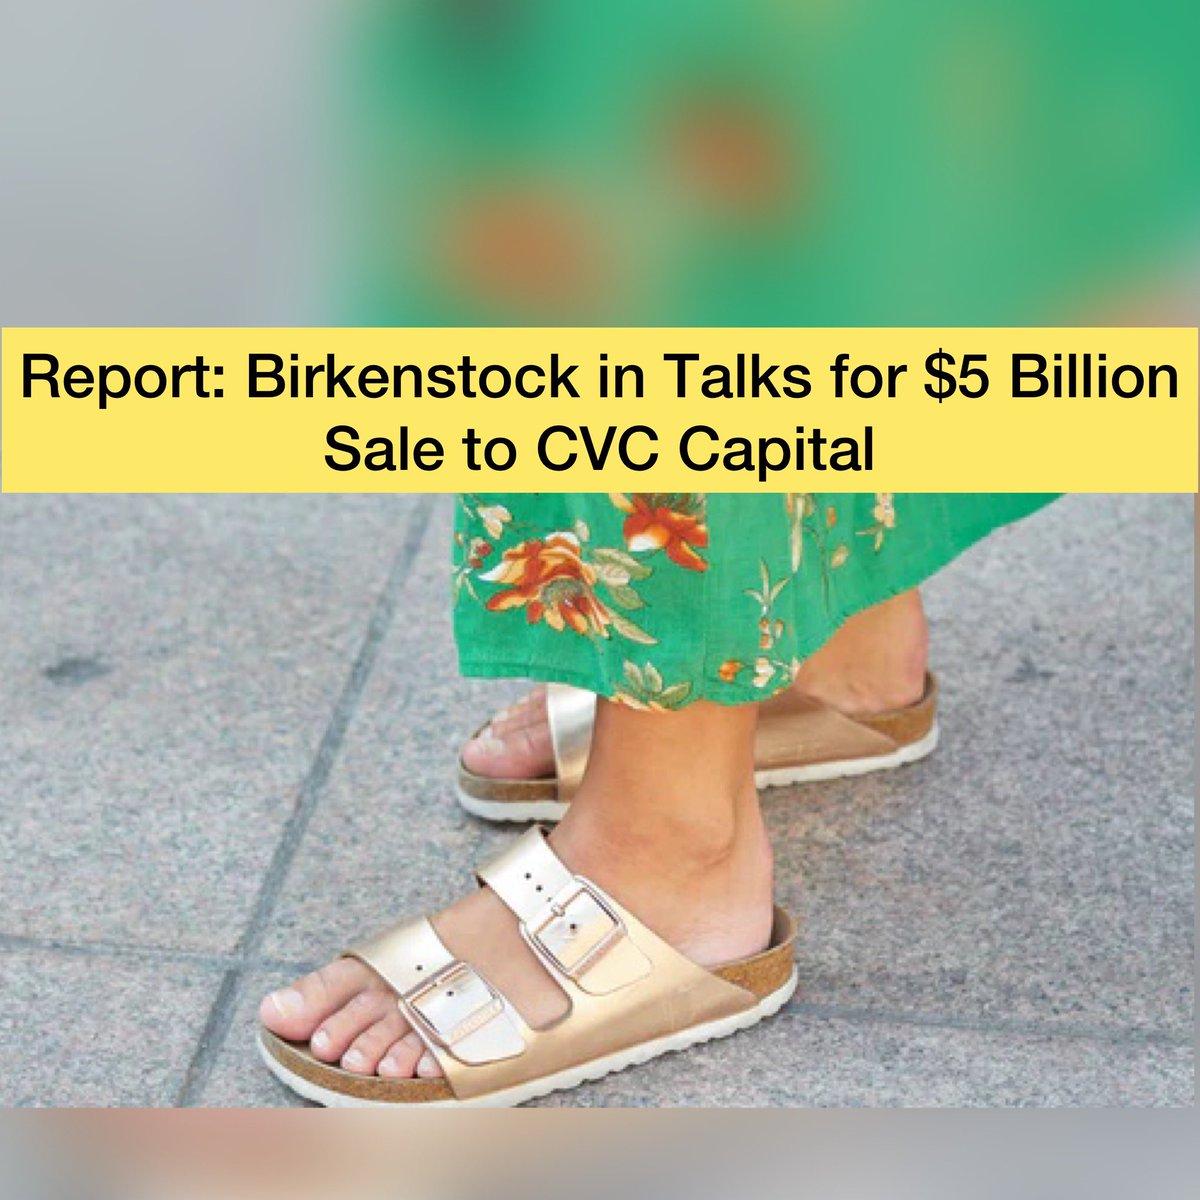 What do you think???    #WaleGoodVibes #ลุงพล #FWBเชียงใหม่ #fashionblogger #fashion #Fashionista #fashionstyle #fashionnova #Ankara #BidenHarrisInauguration #Birkenstock #Foodie #footwear #luxury #Shoes #handmade #Mensfashion #womensfashion #Minecraft #MLK